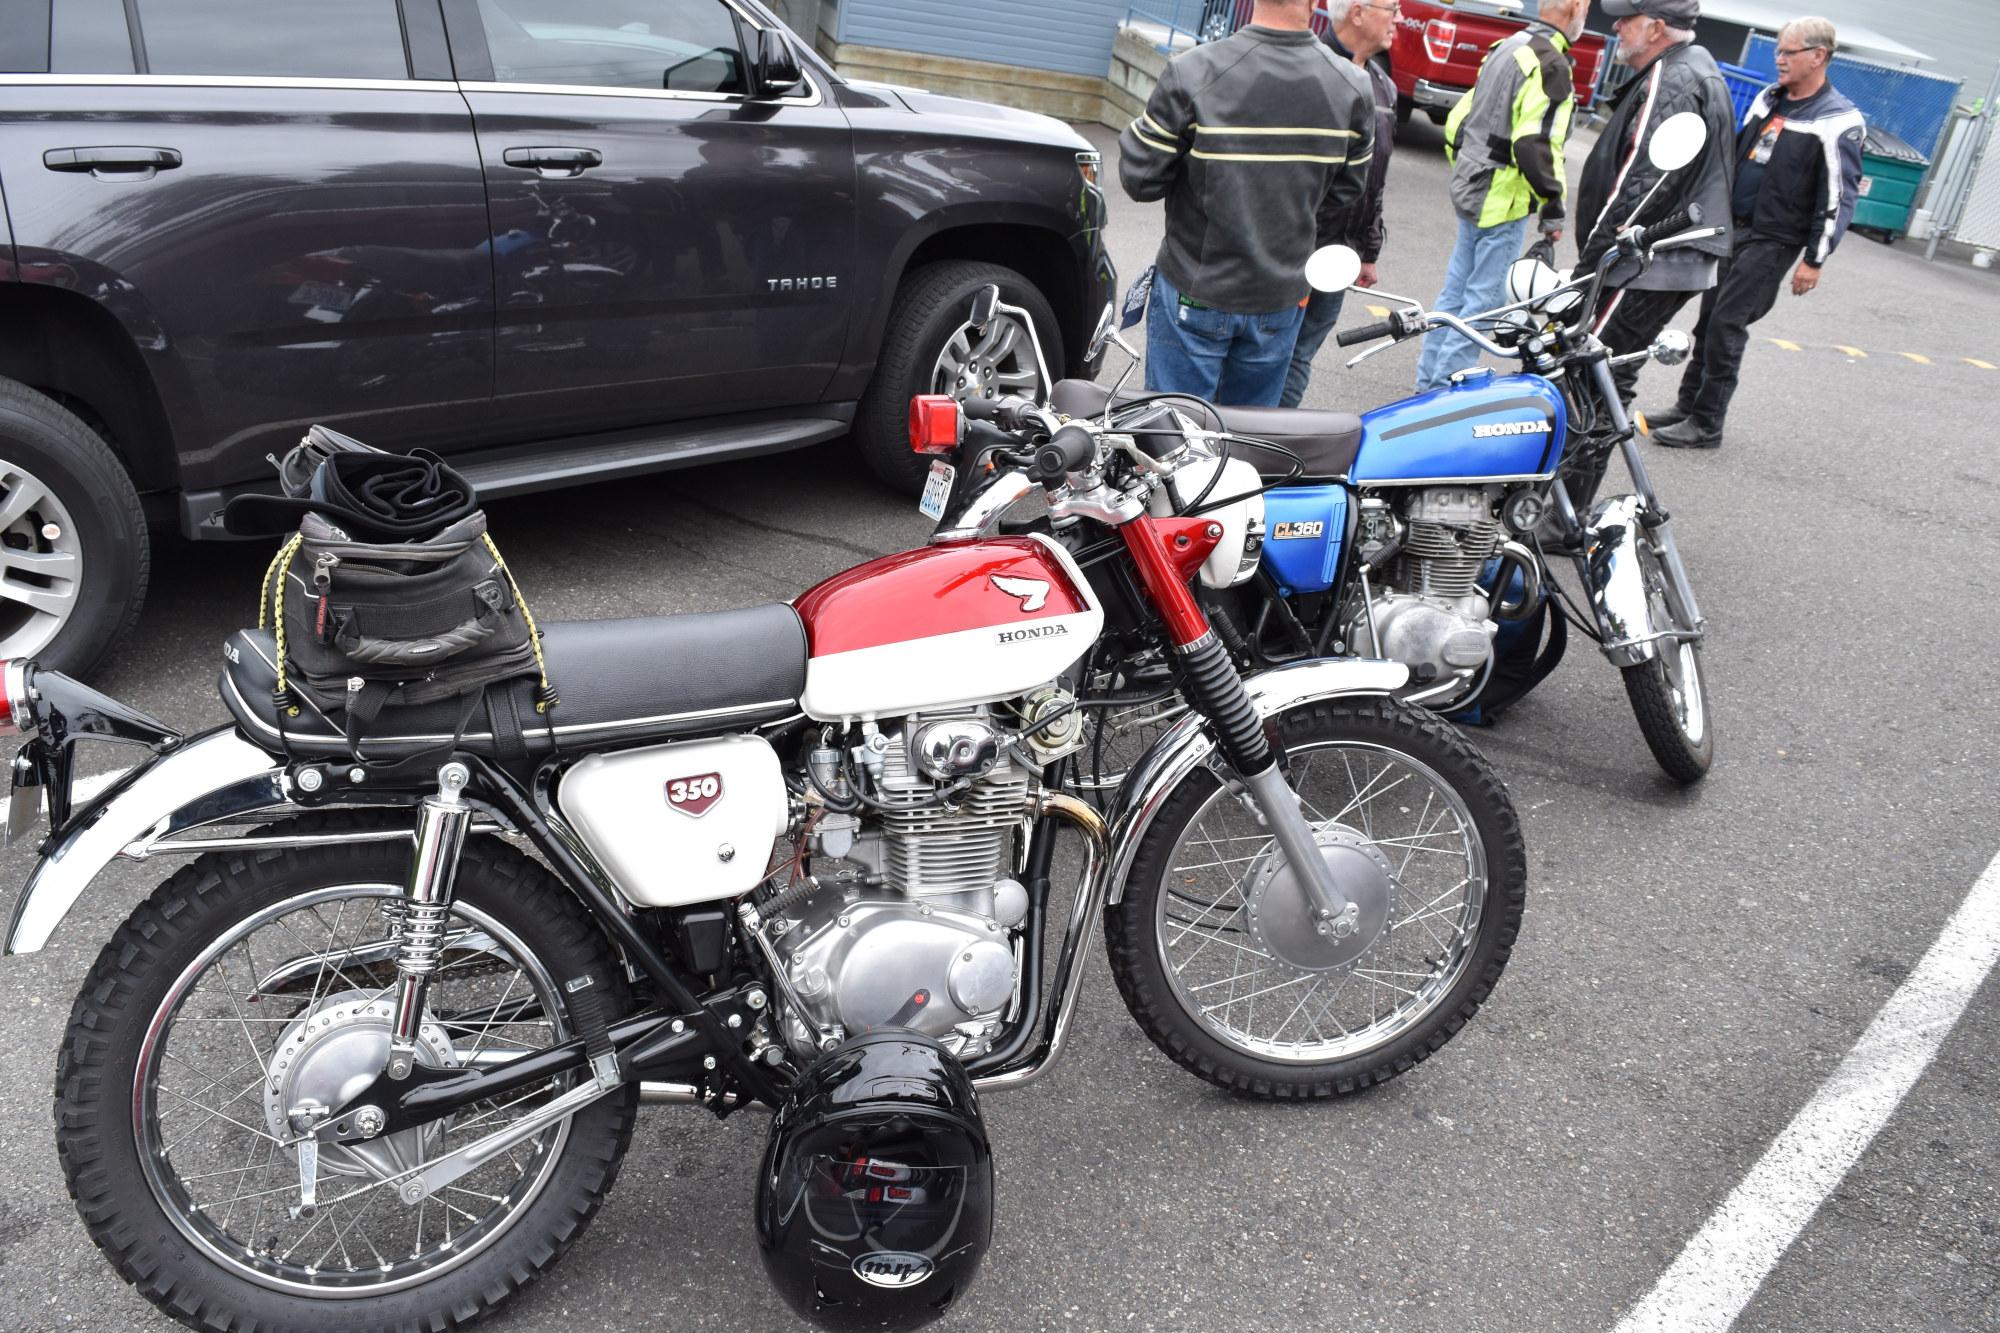 2019 VME Pre-1975 Ride-honda-tides-4.jpg